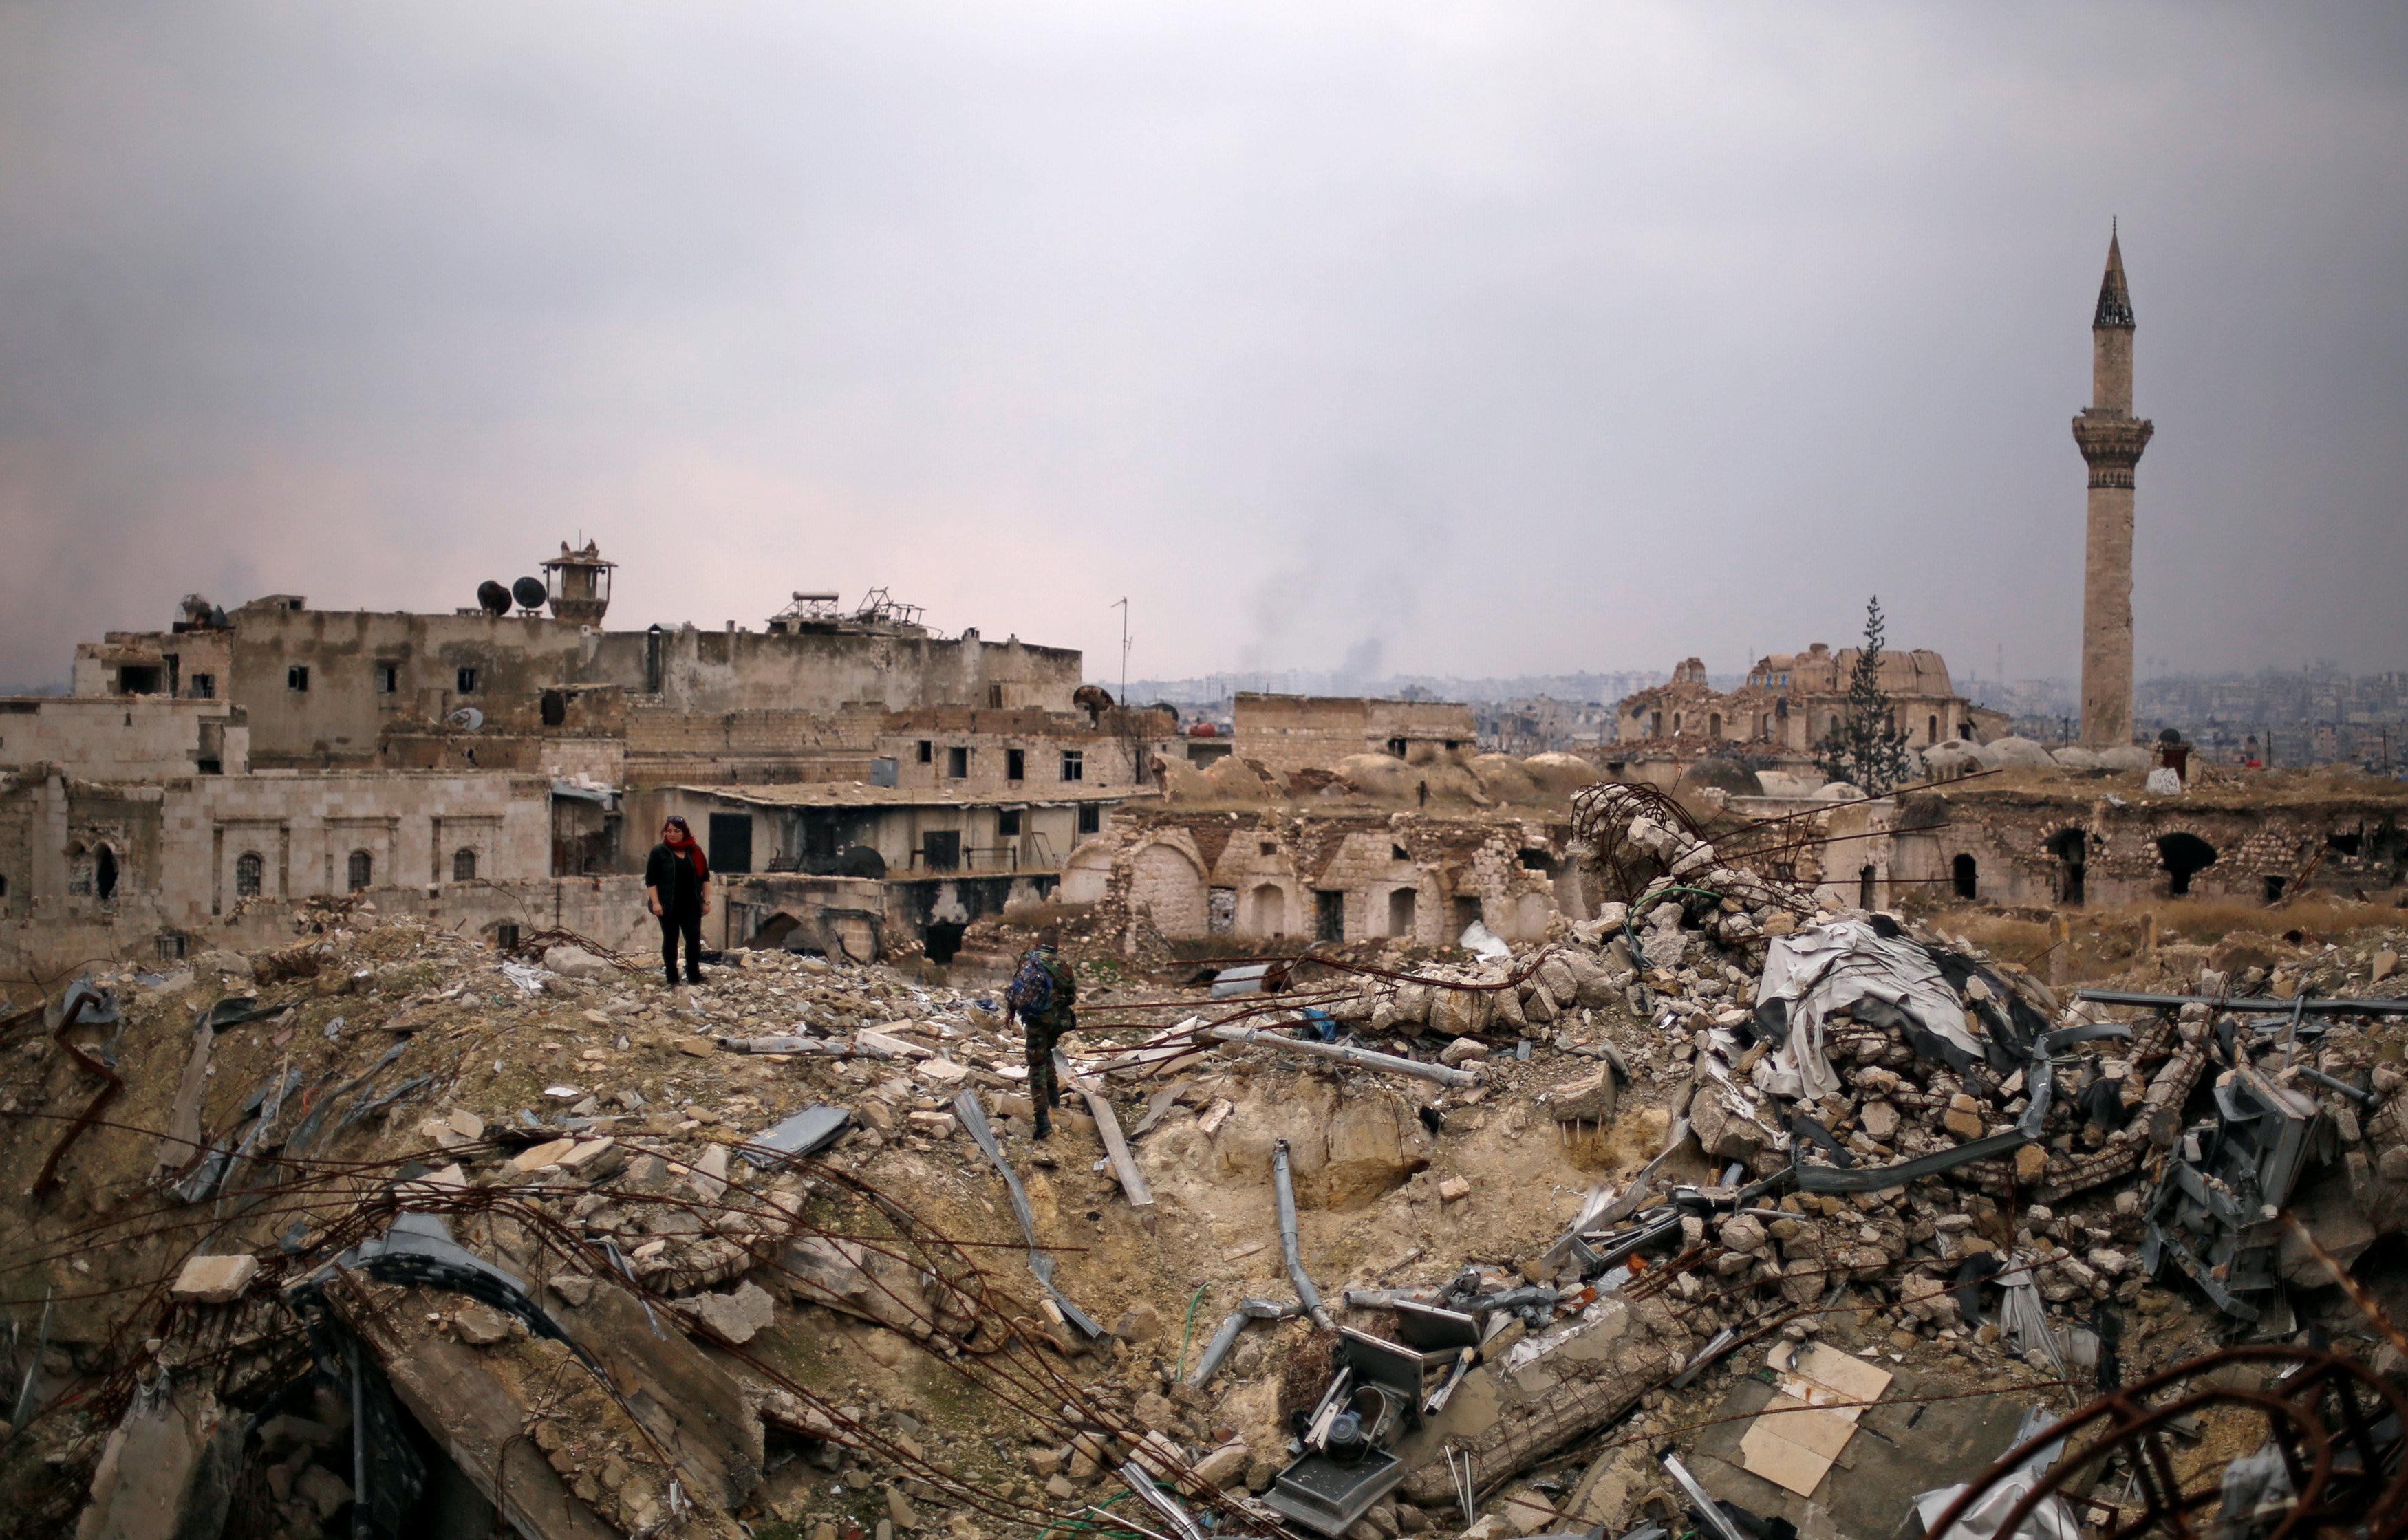 2016 12 17T184237Z 1790794752 RC1C5AE38E60 RTRMADP 3 MIDEAST CRISIS SYRIA